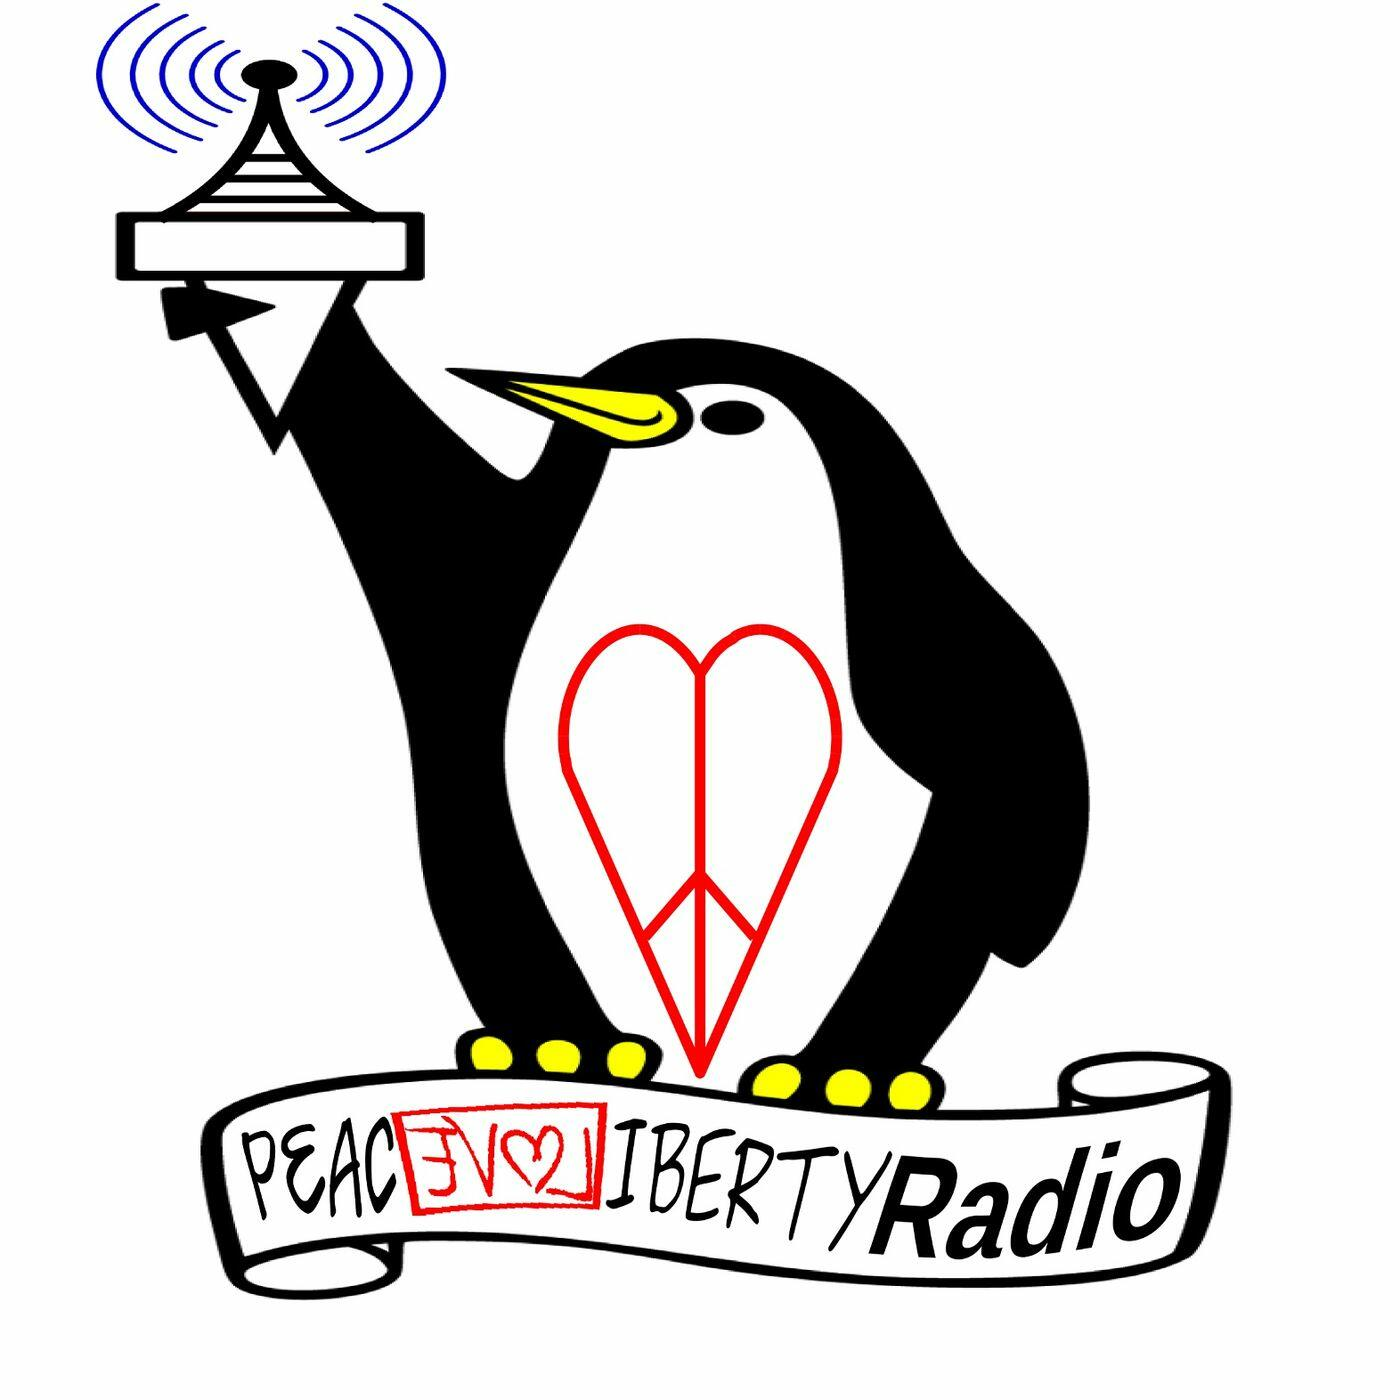 Peace, Love, Liberty Radio